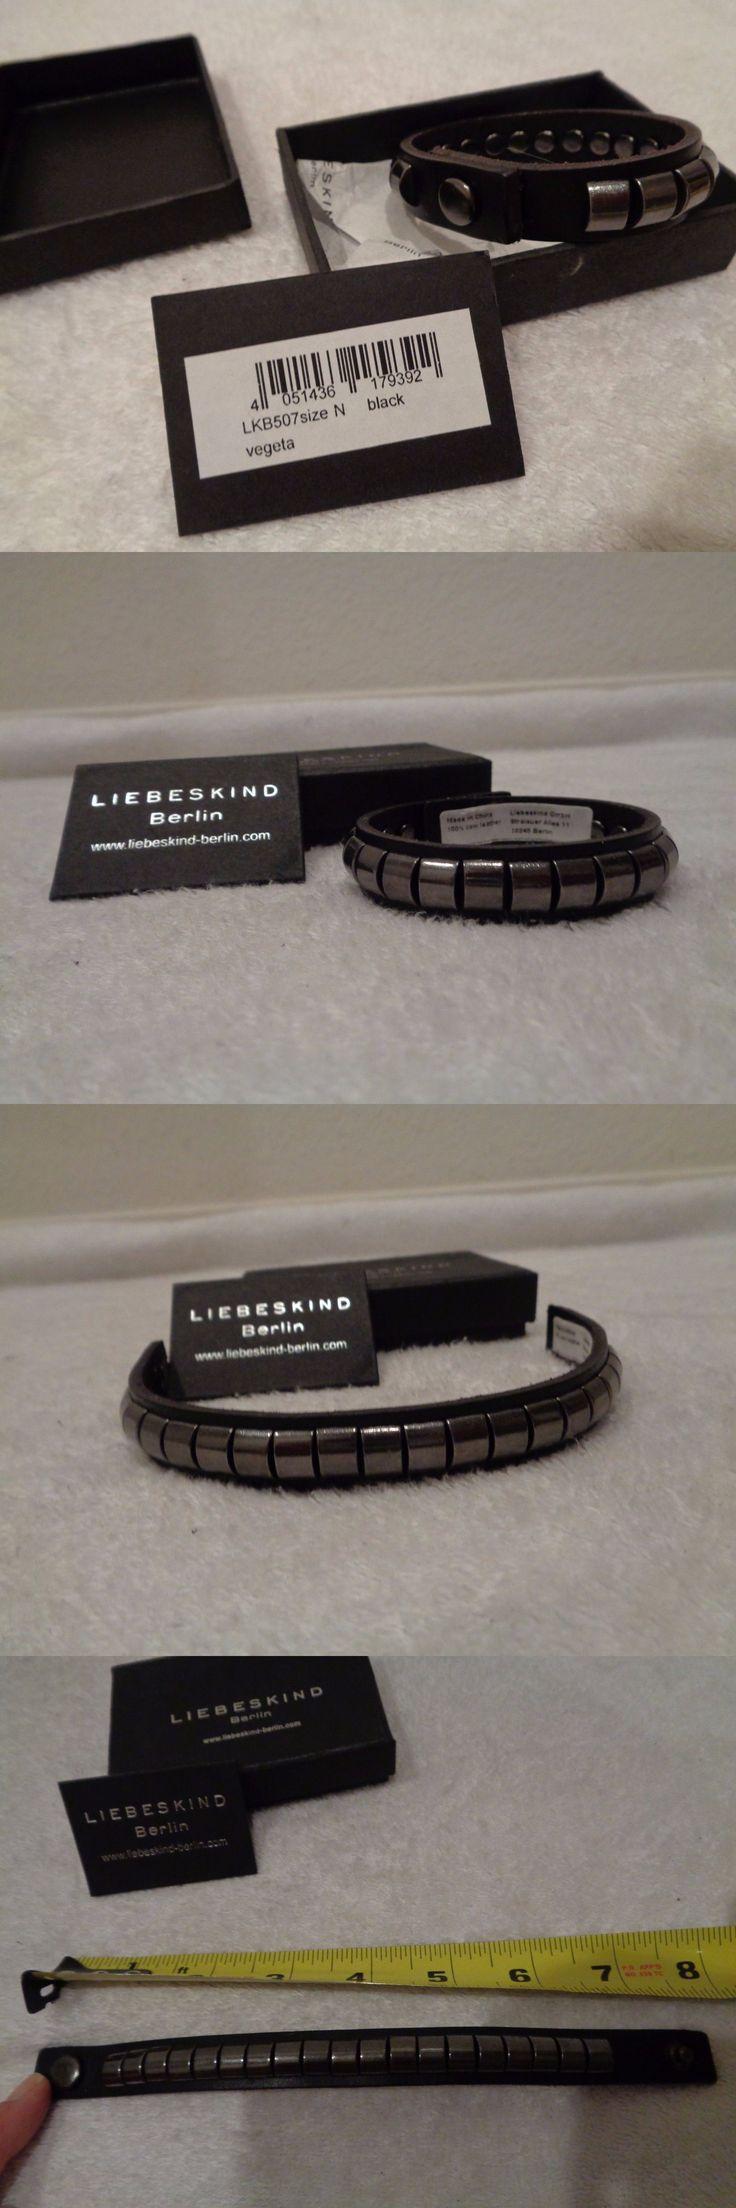 Wristbands 112603: Liebeskind Berlin Leather Studded Metal Wristband/Bracelet Nib! Lkb507 Black $98 BUY IT NOW ONLY: $31.5